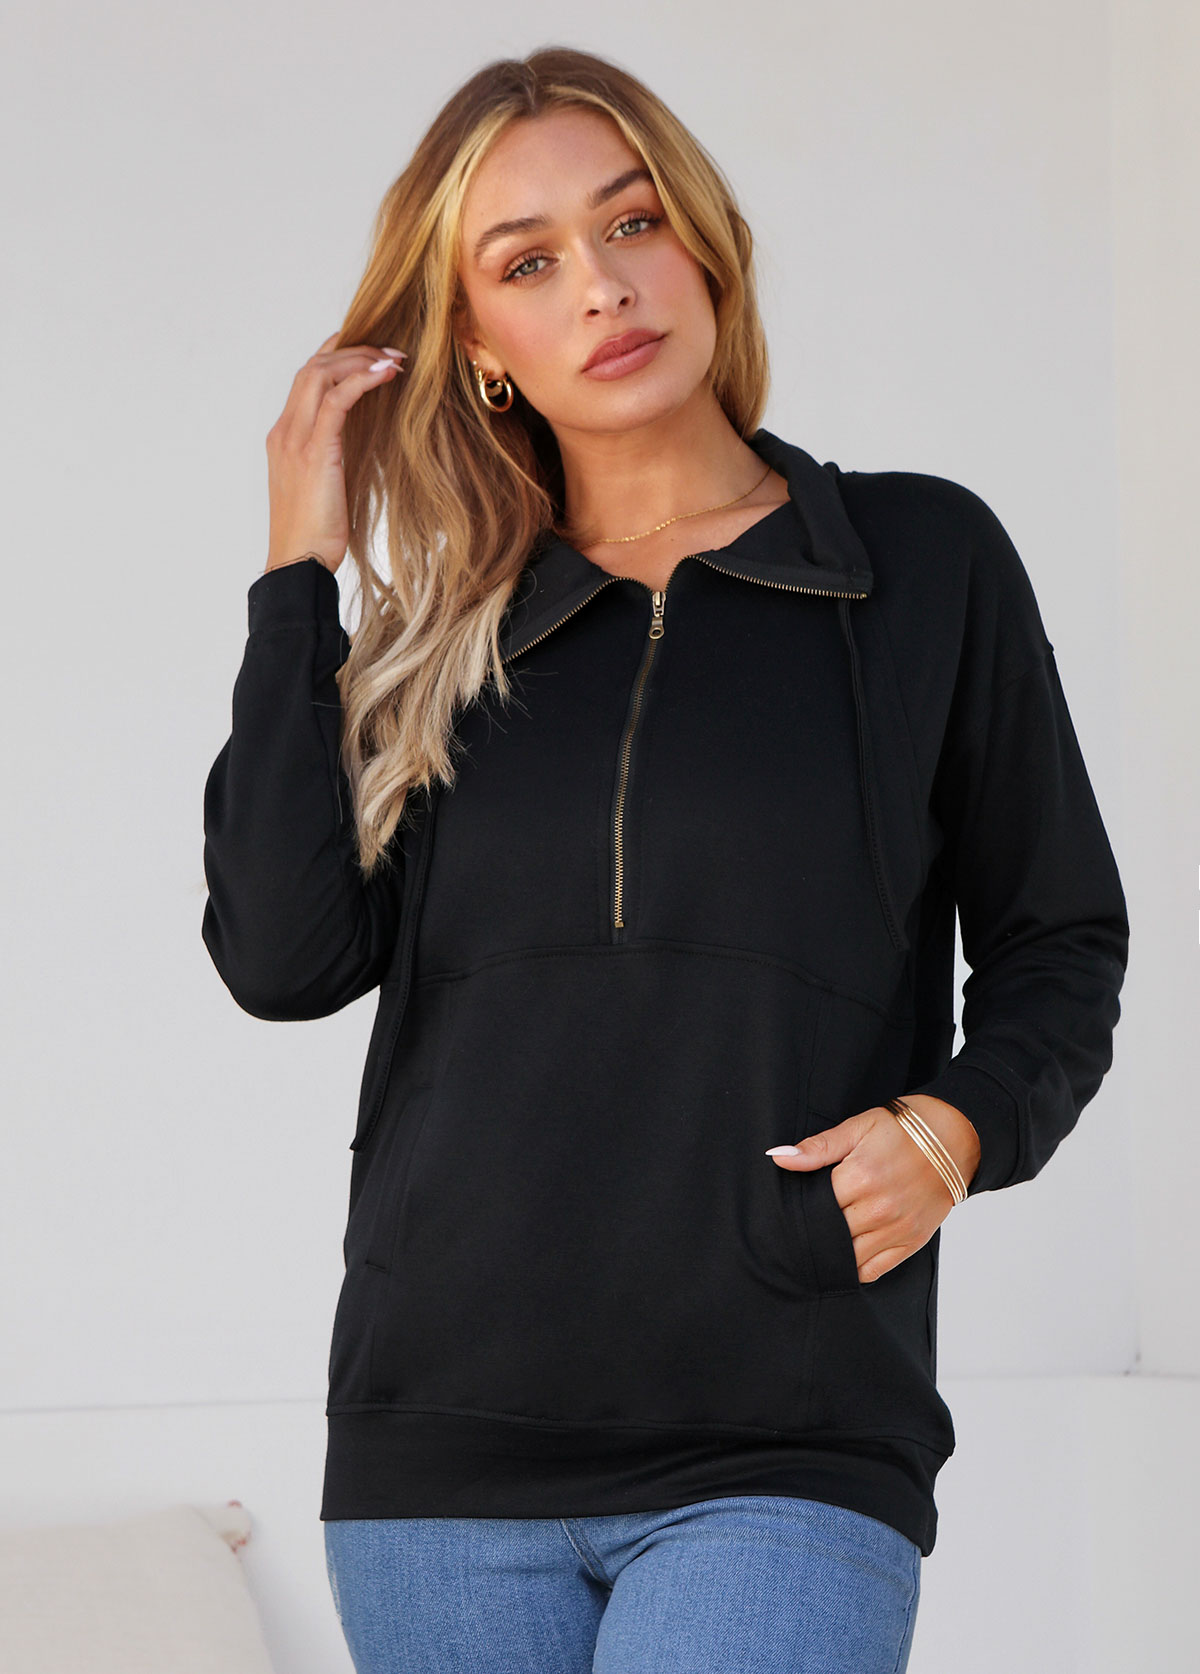 Quarter Zip Double Side Pockets Long Sleeve Sweatshirt